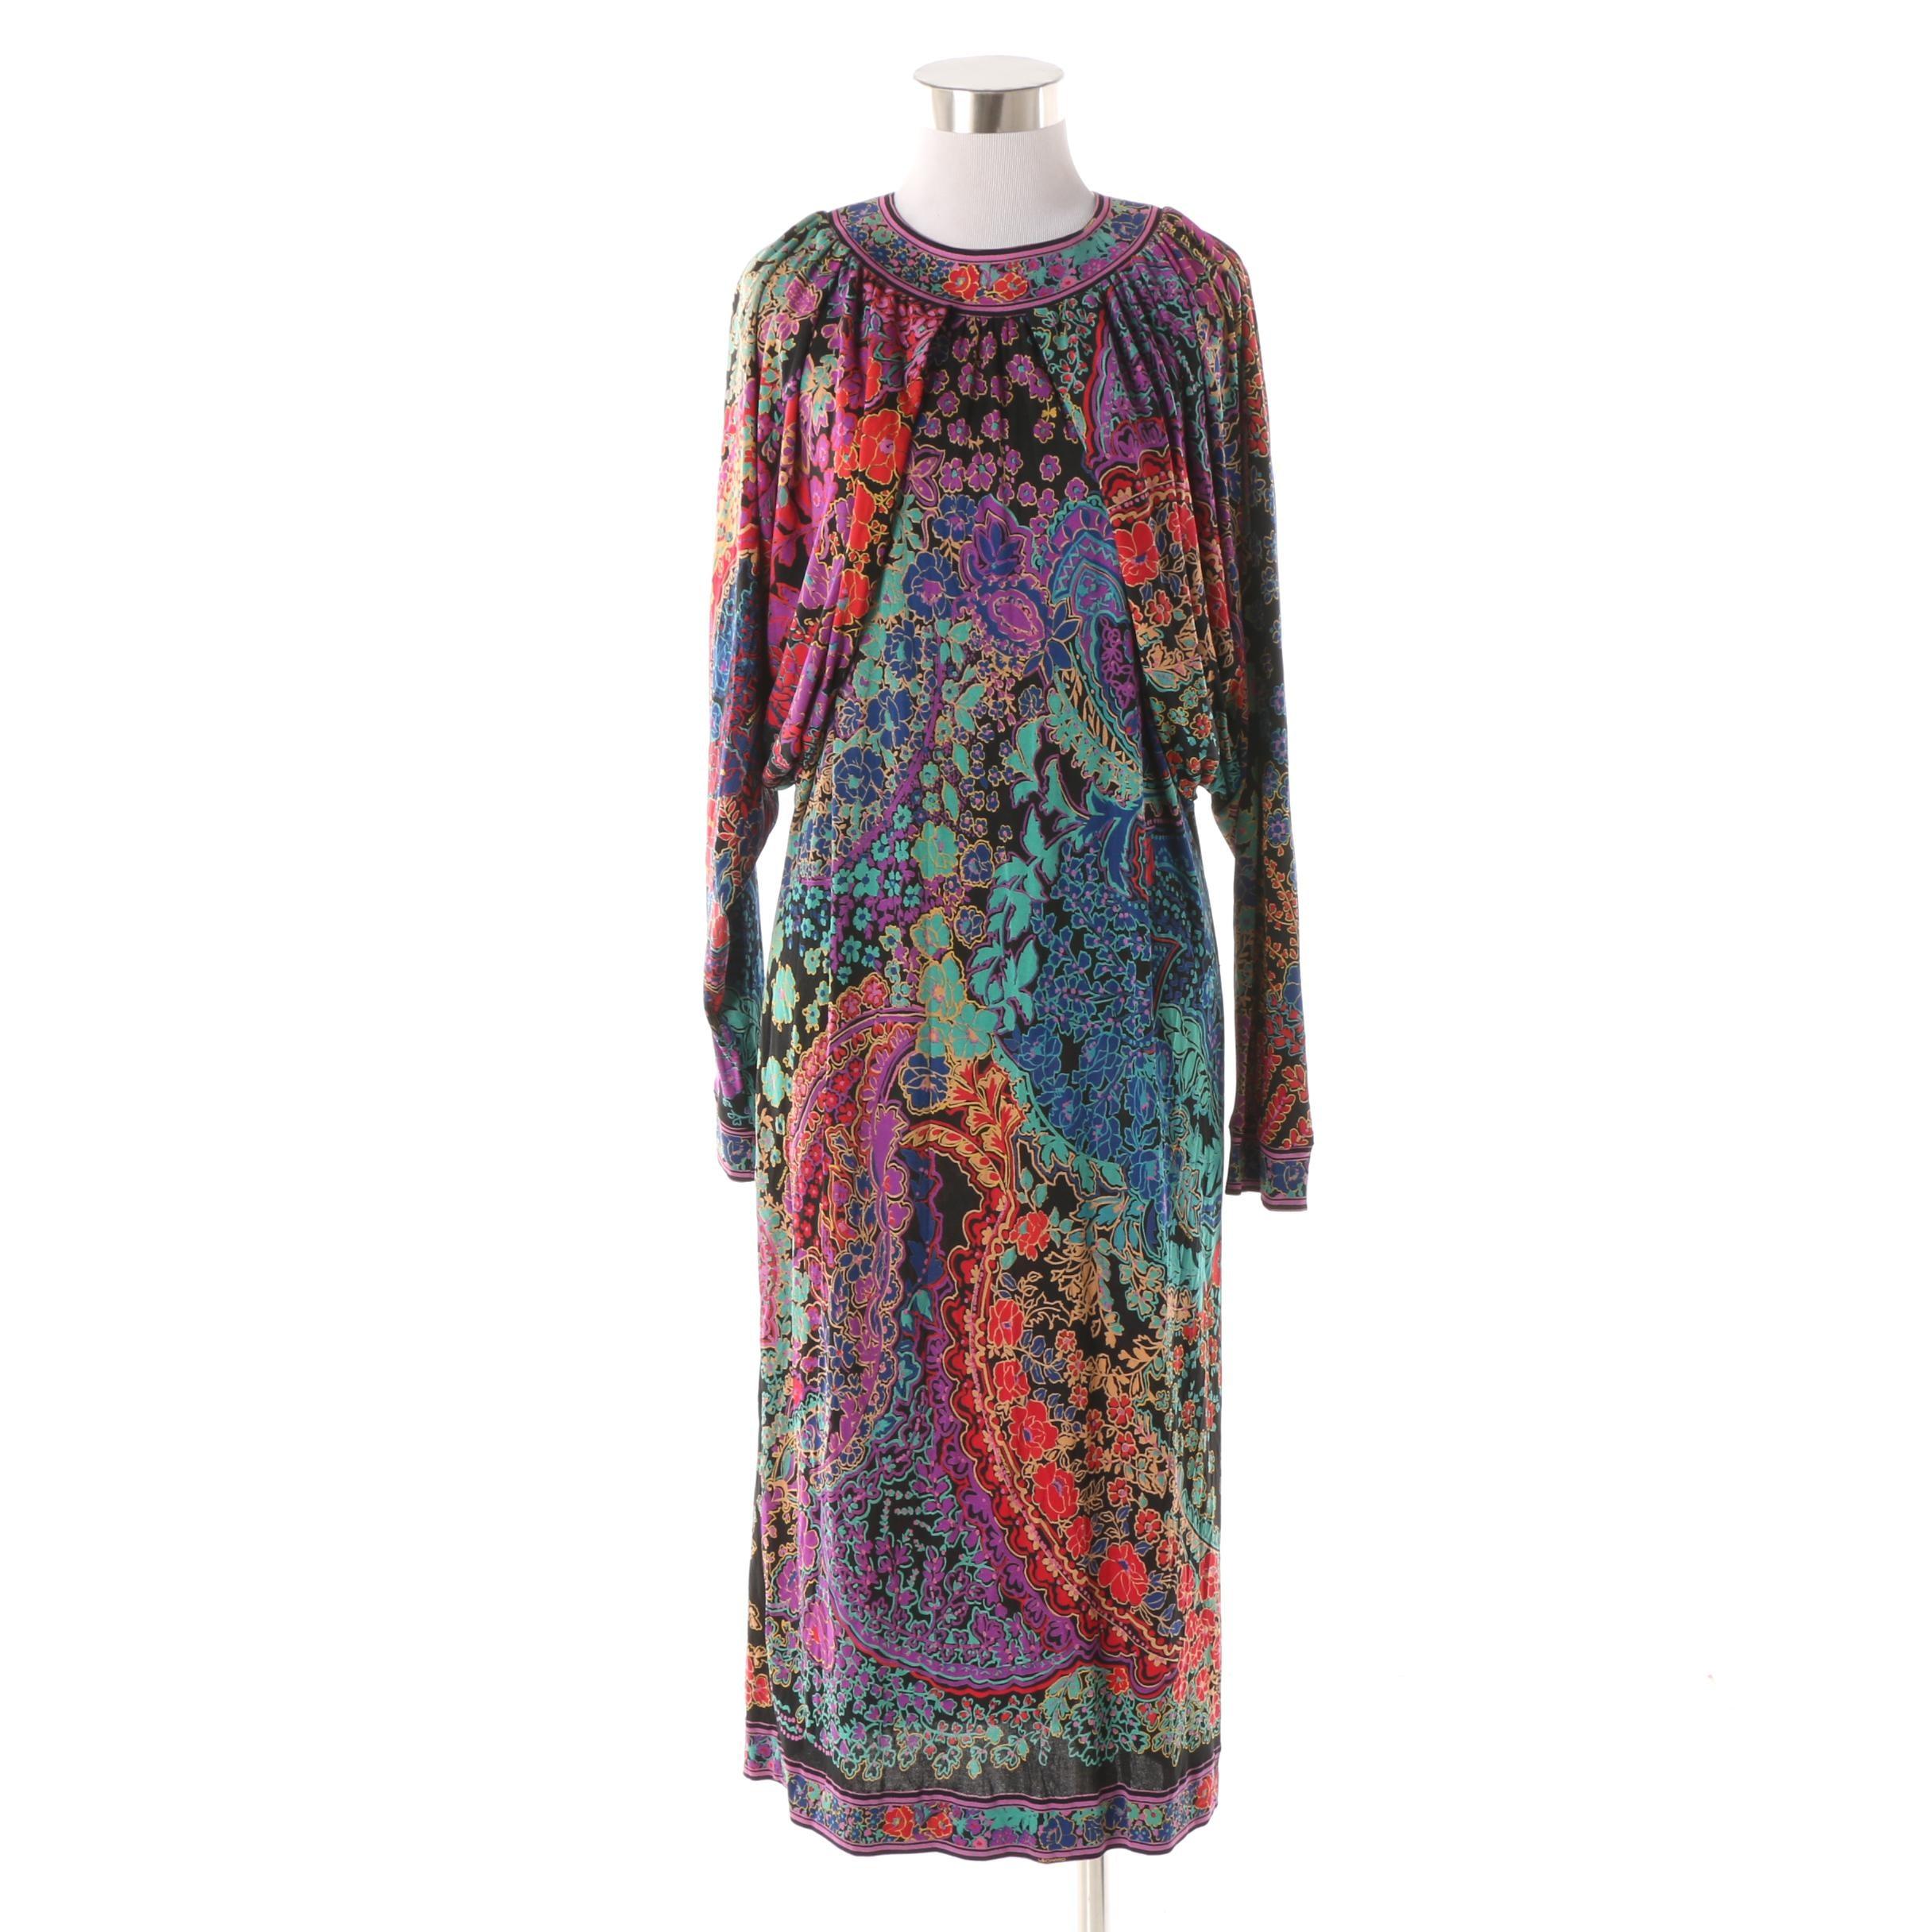 Leonard Studio Paris Mikado Multicolor Silk Print Jersey Dress, 1970s Vintage